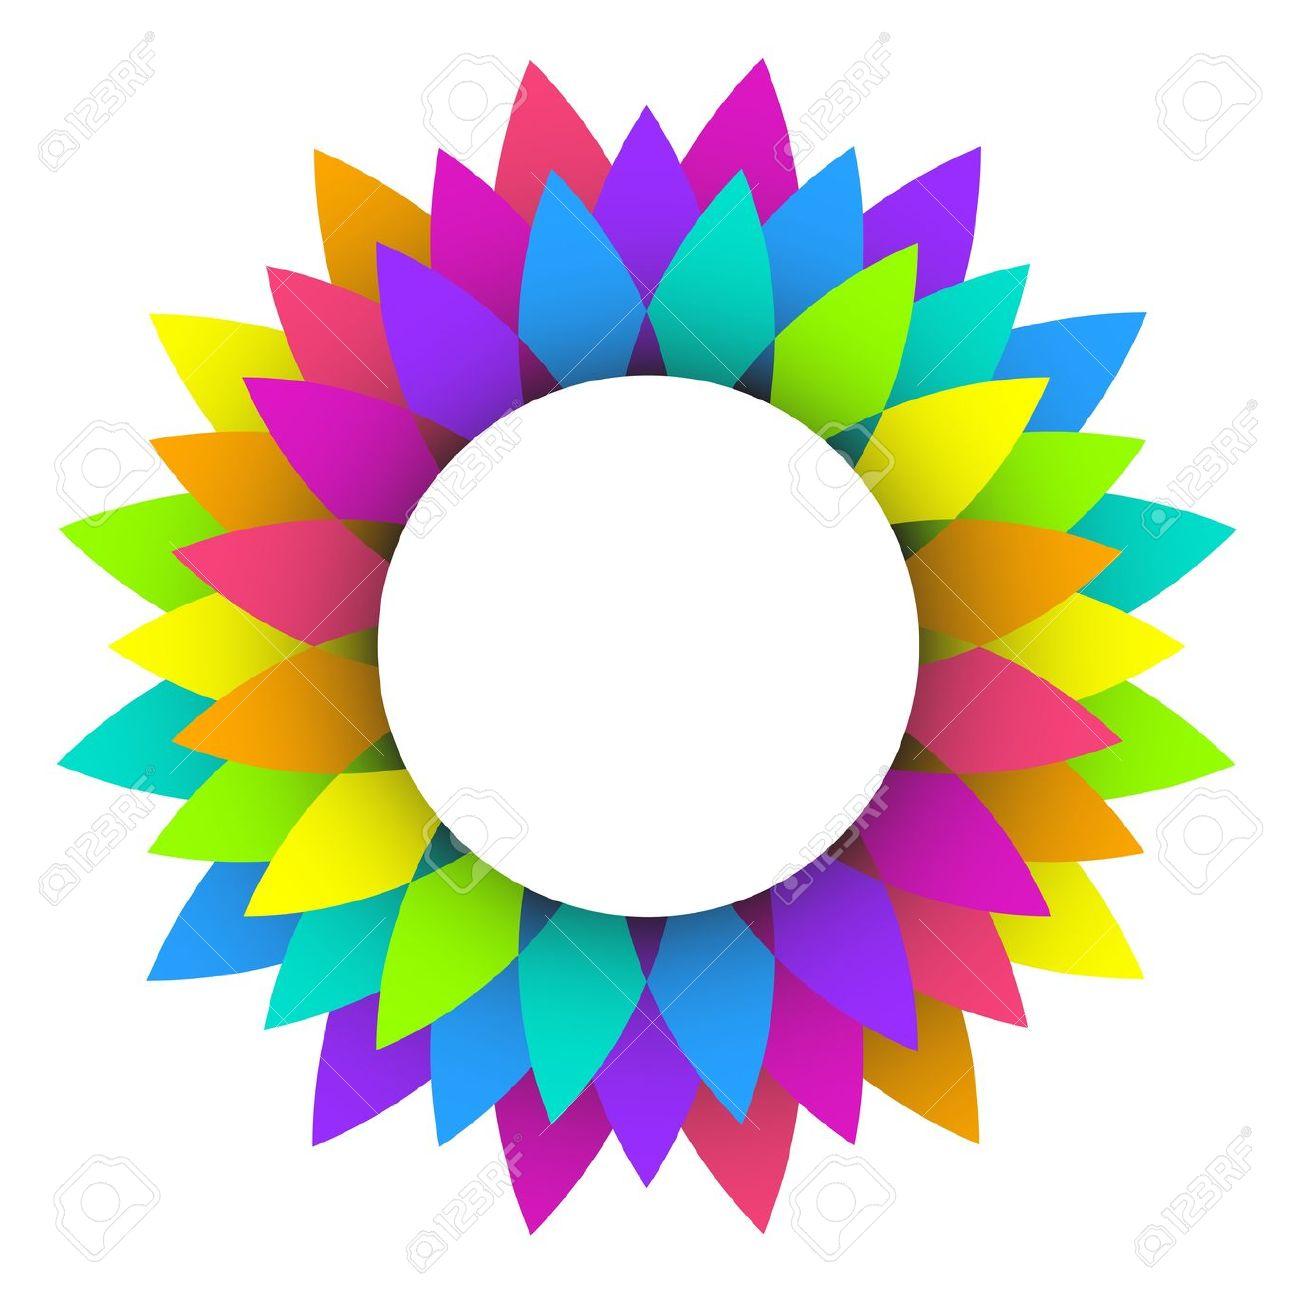 Illustration Of Abstract Rainbow Flower Logo Design Royalty Free.